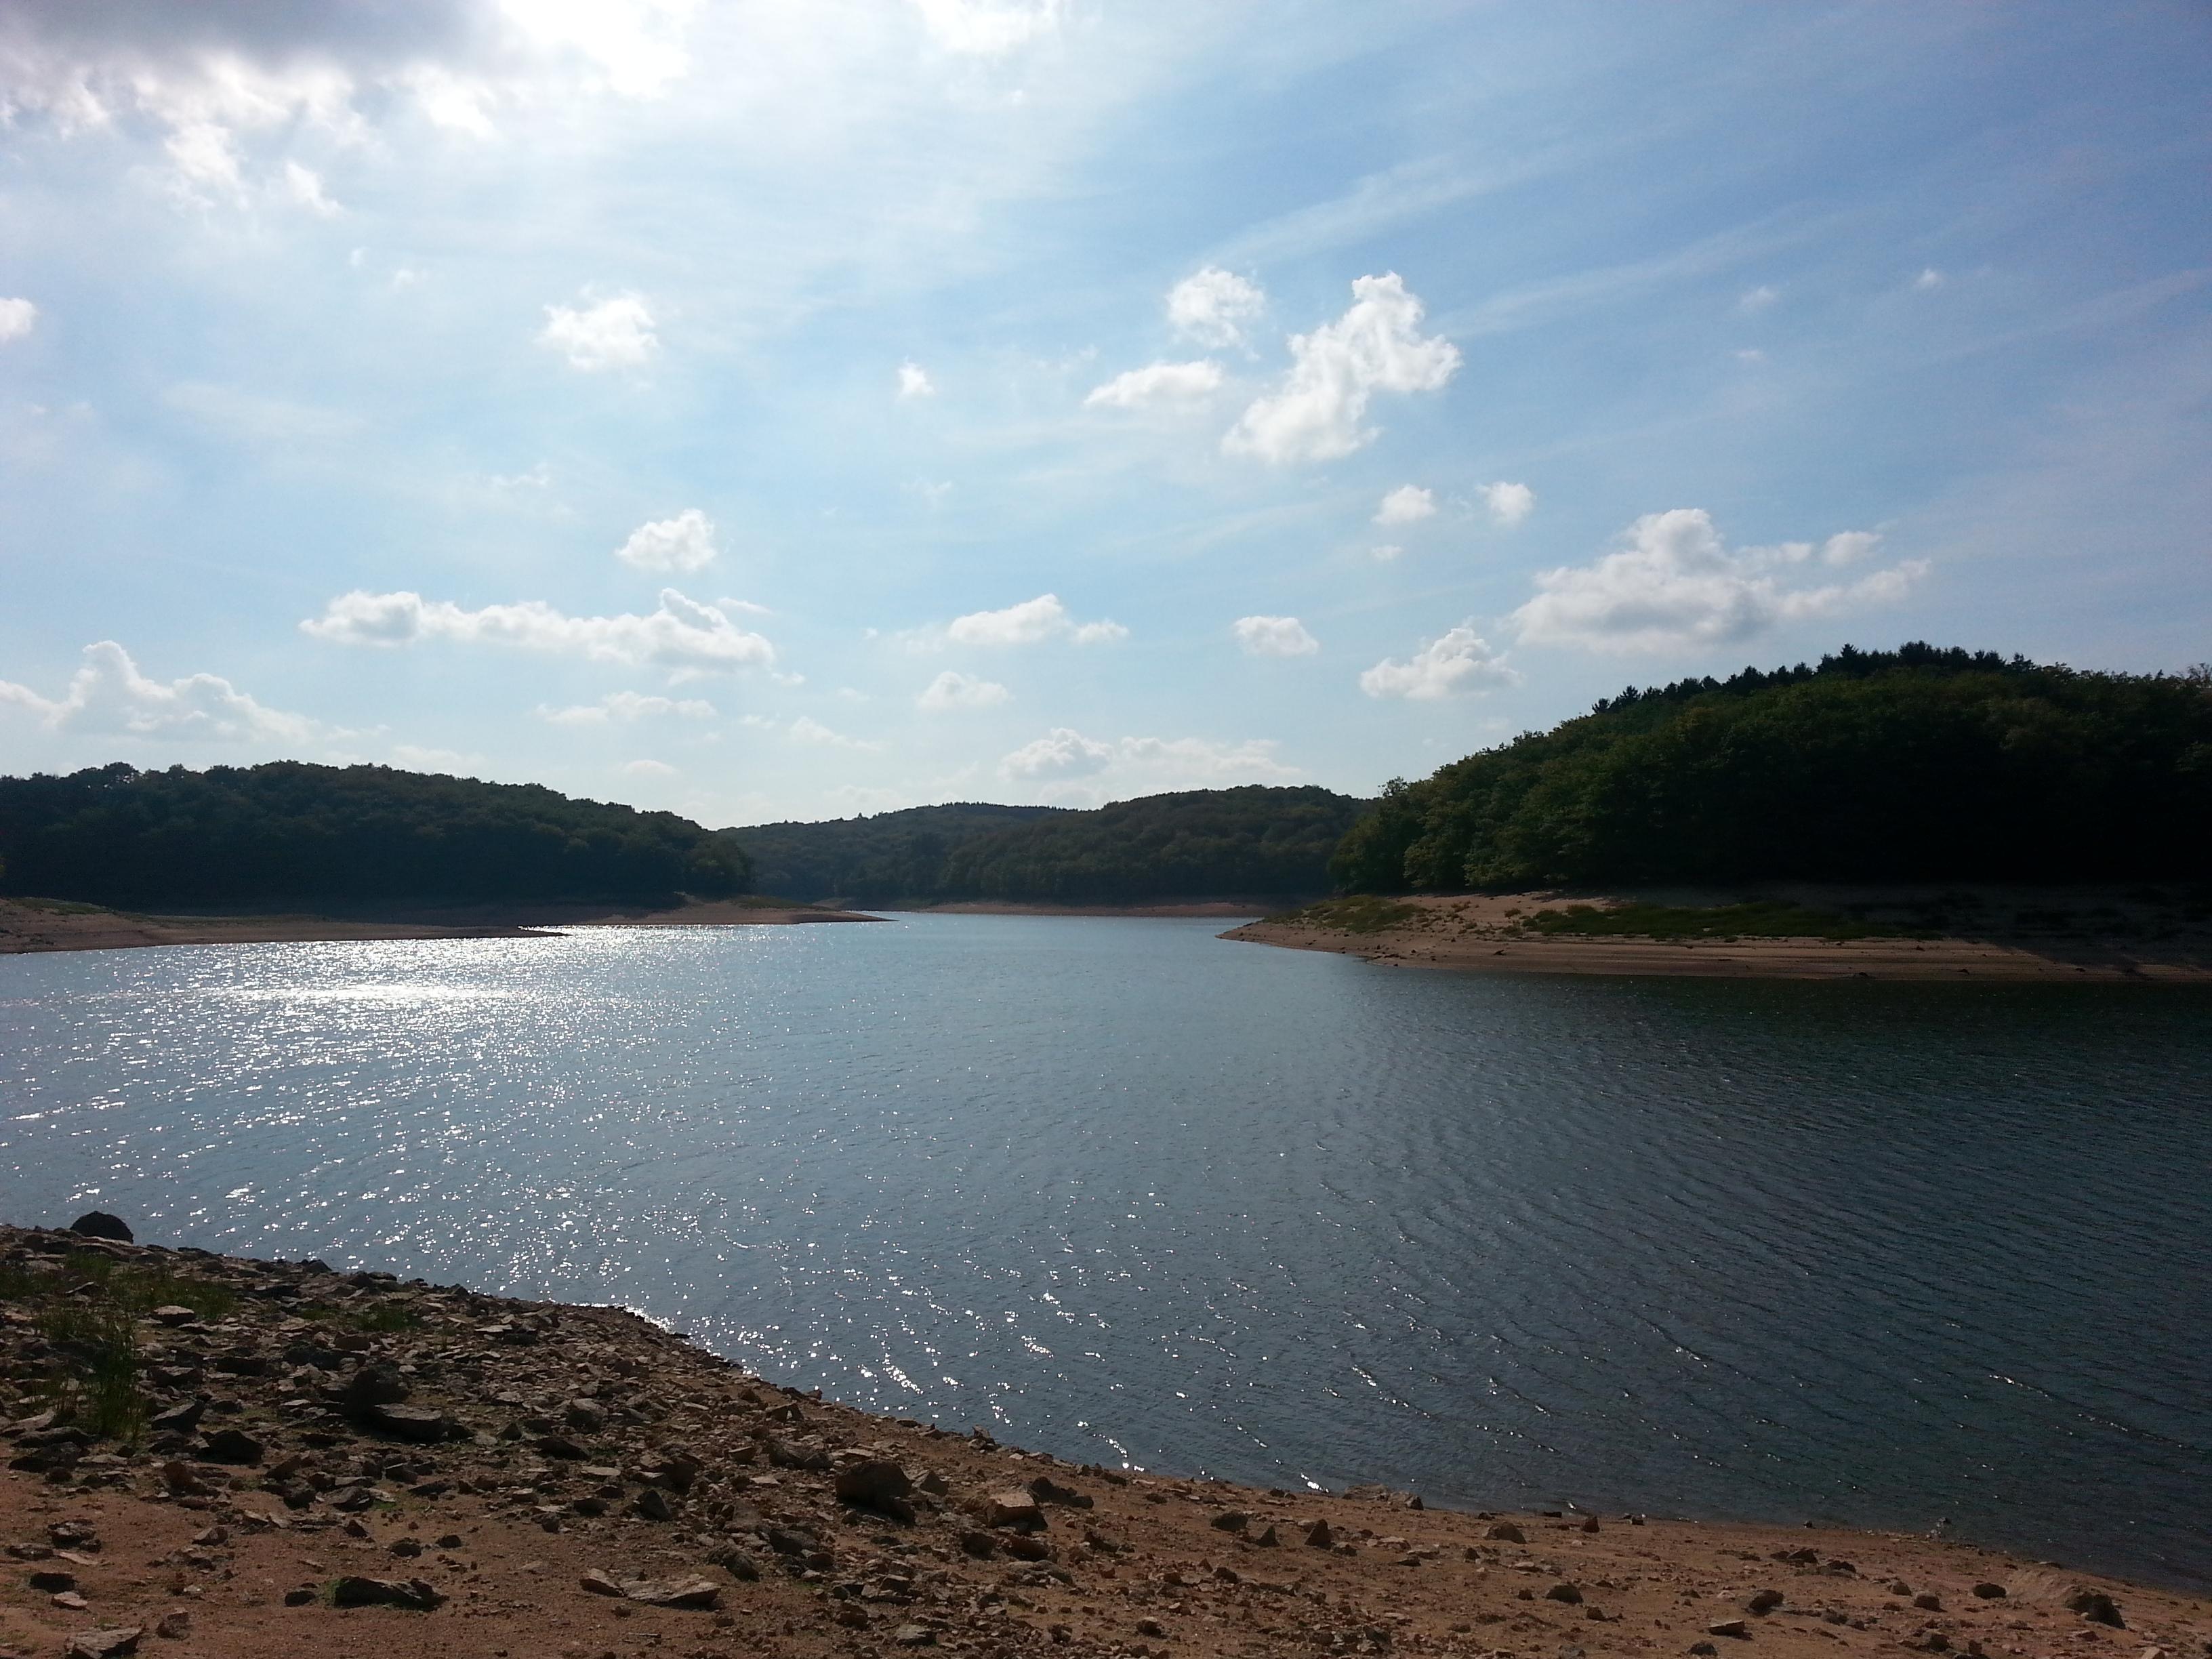 Lac de Chaumecon bij Brassy